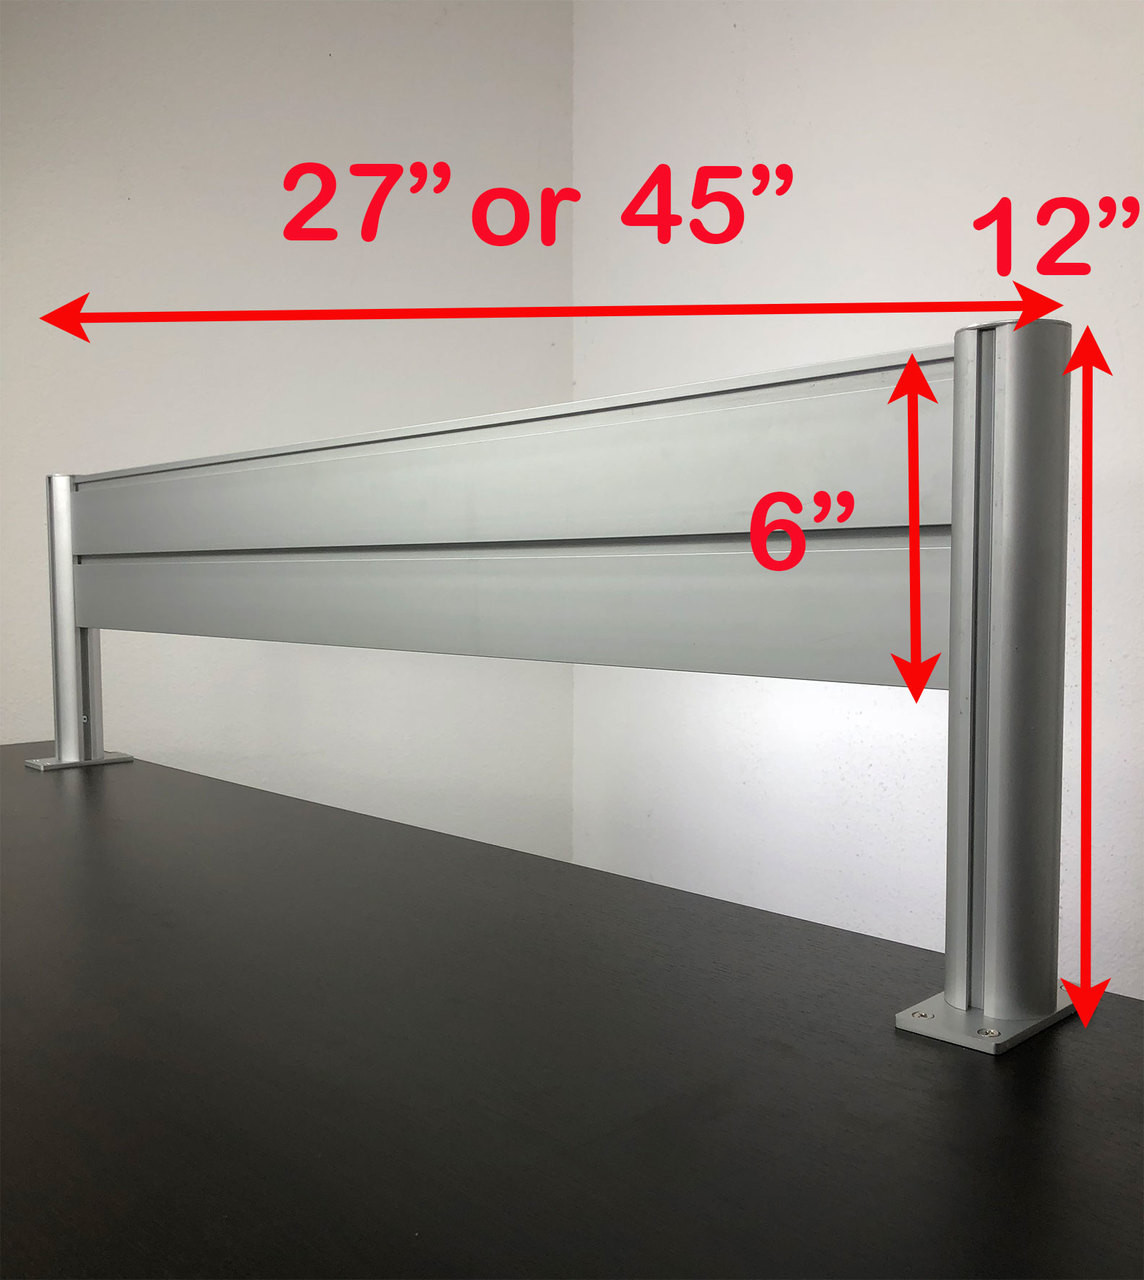 "Office Desk 47"" x 12"" Aluminum Organzier / Divider Panel Slatwall, #OT-SUL-HANG1"